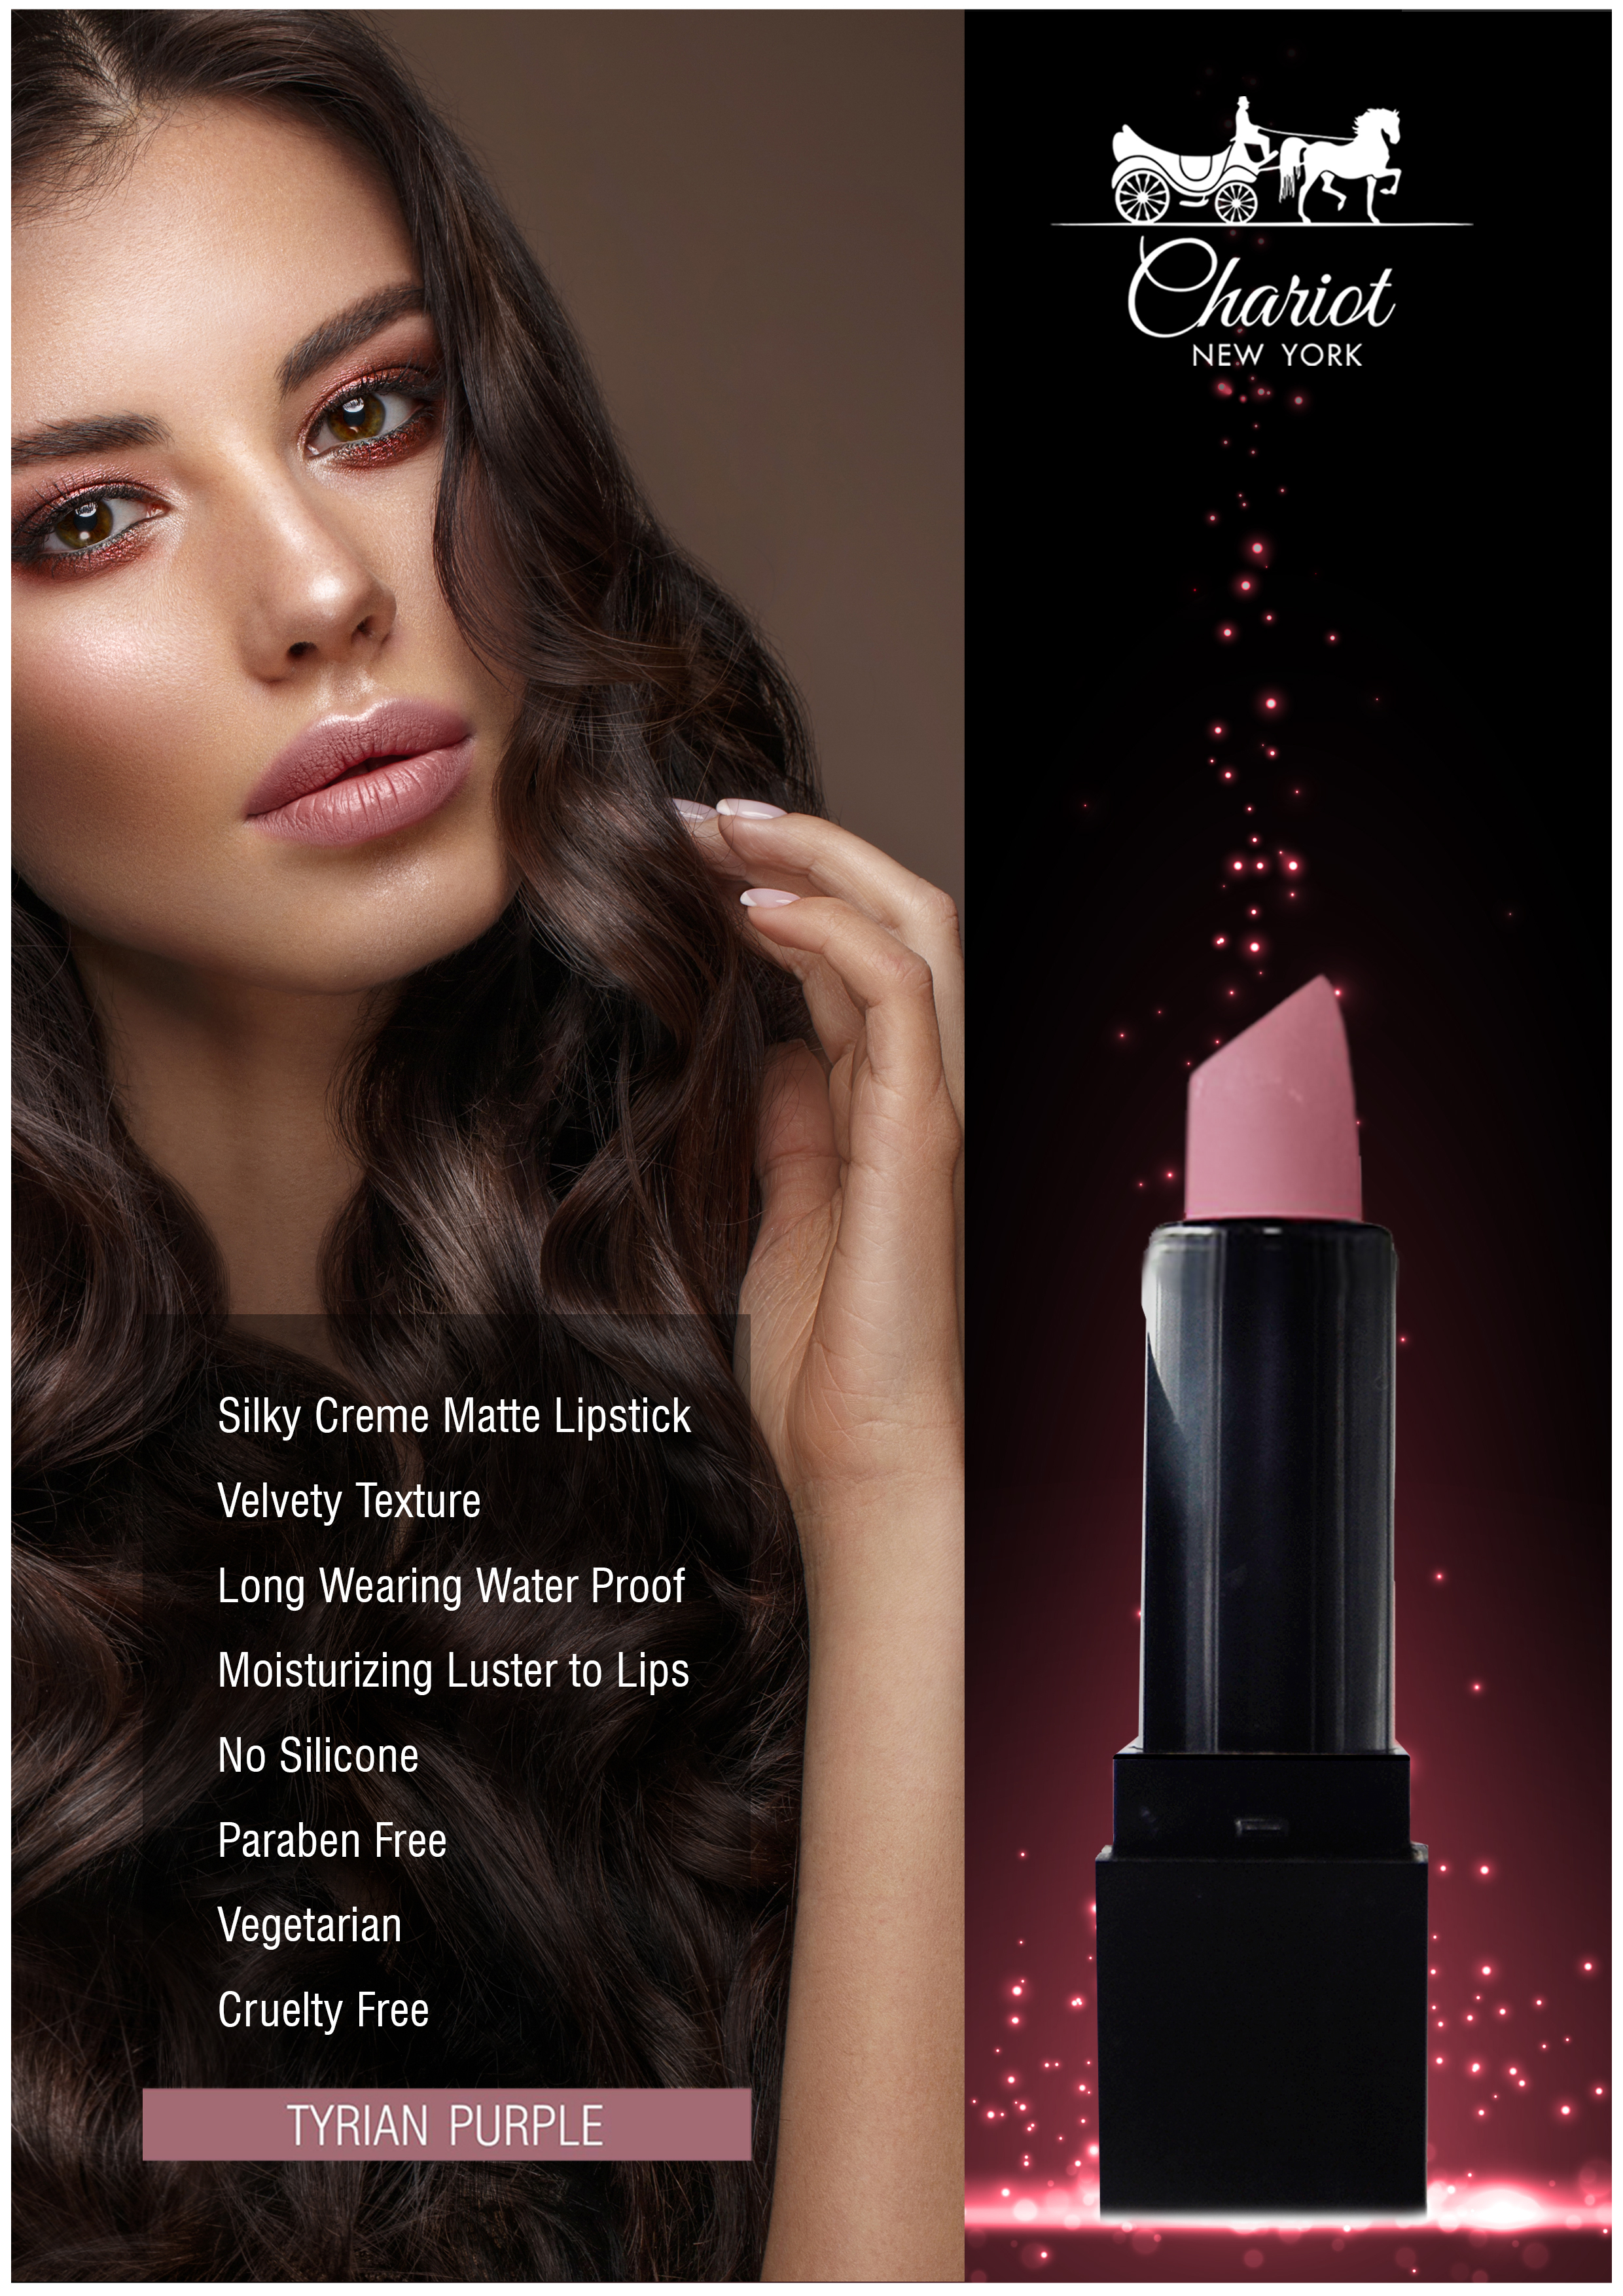 Chariot New York Tyrian Purple Lipstick (Mauve)